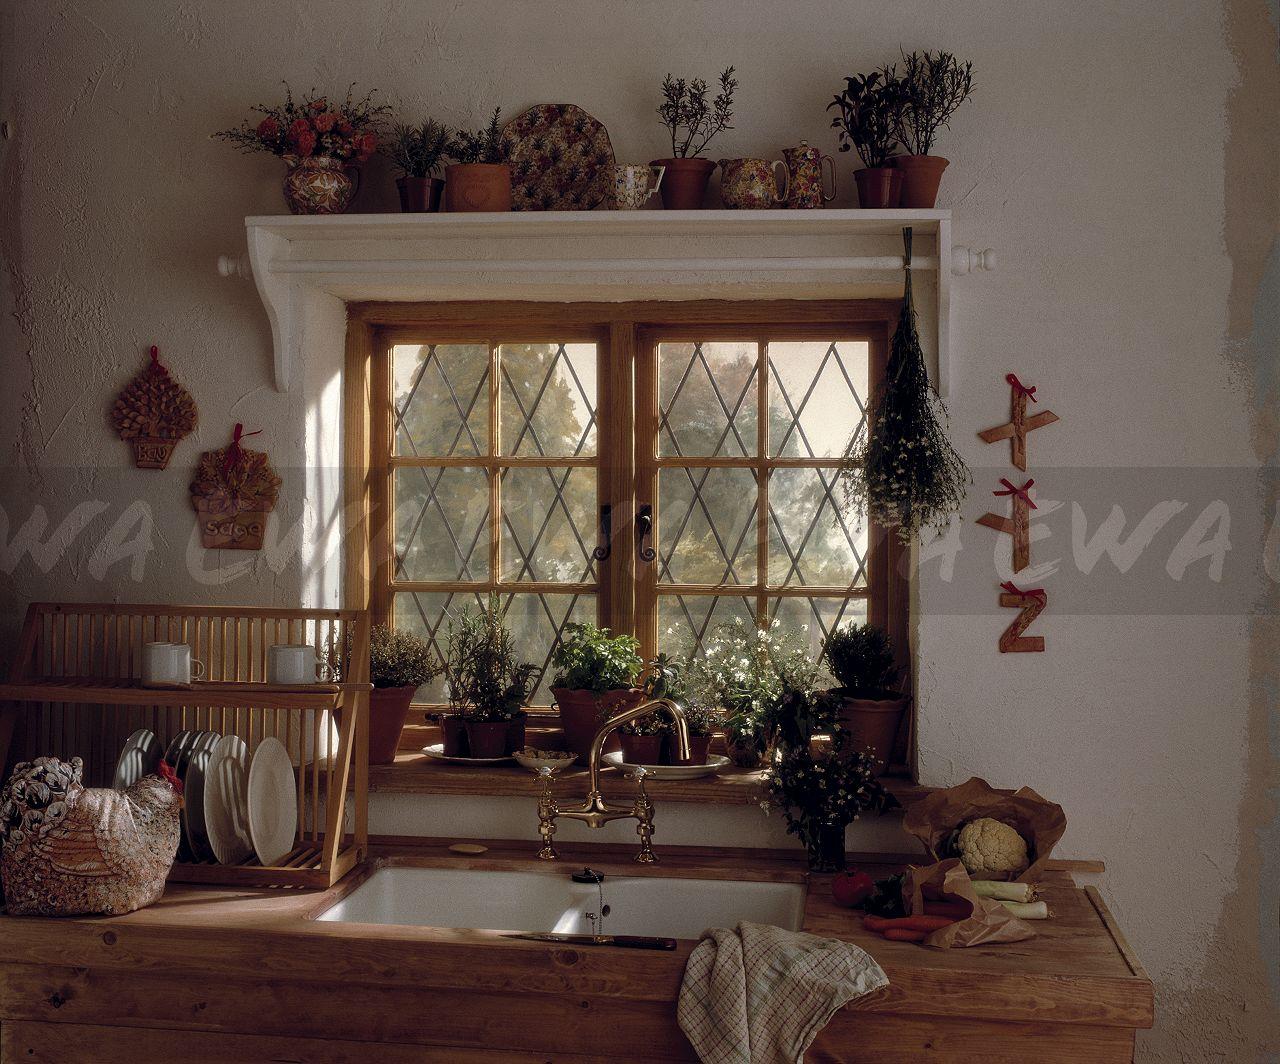 Image Chintz Pattern China On Shelf Above Lattice Window